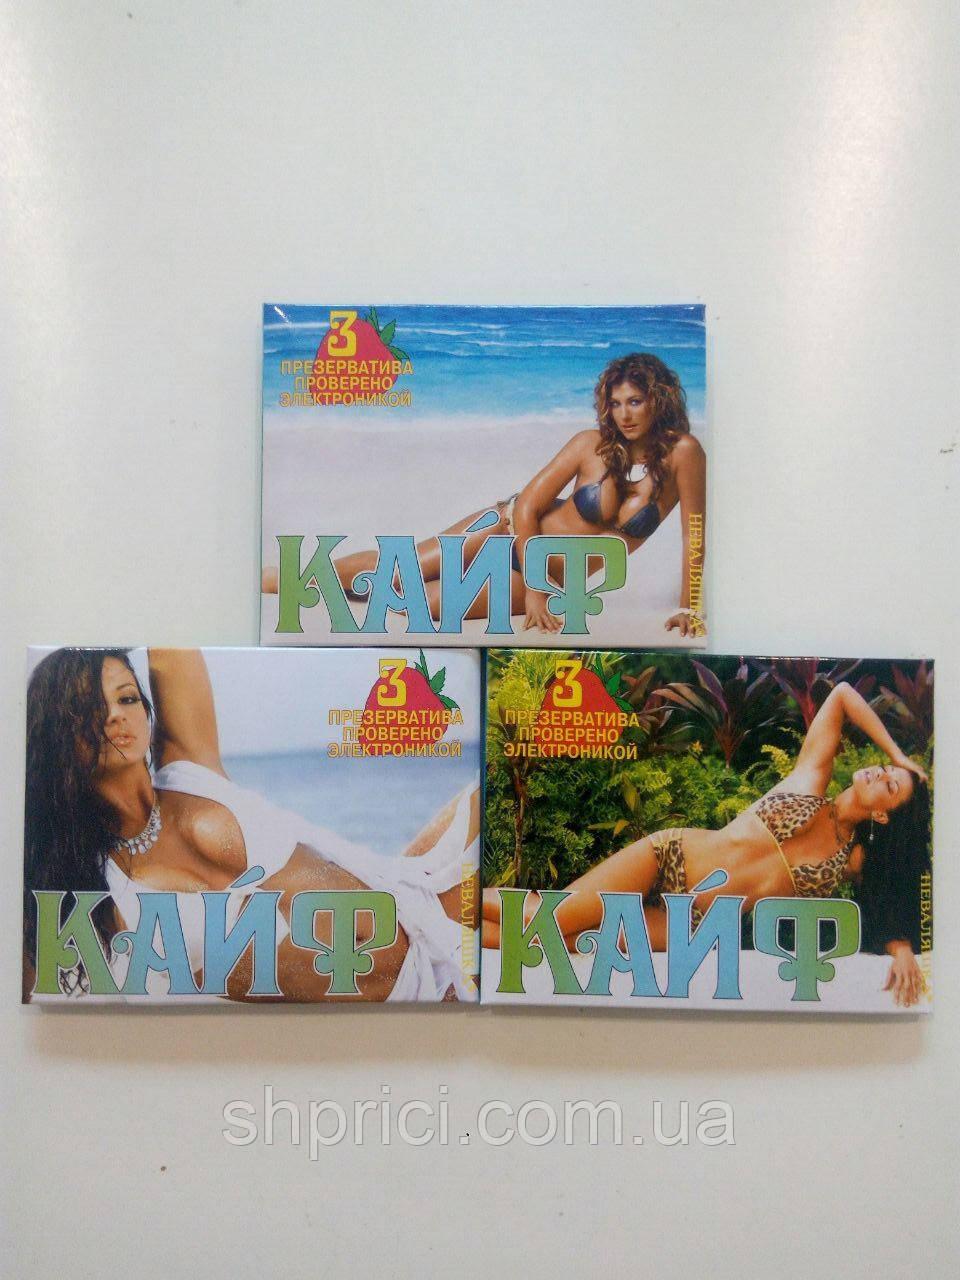 Презерватив Кайф, 3 шт. в упаковке